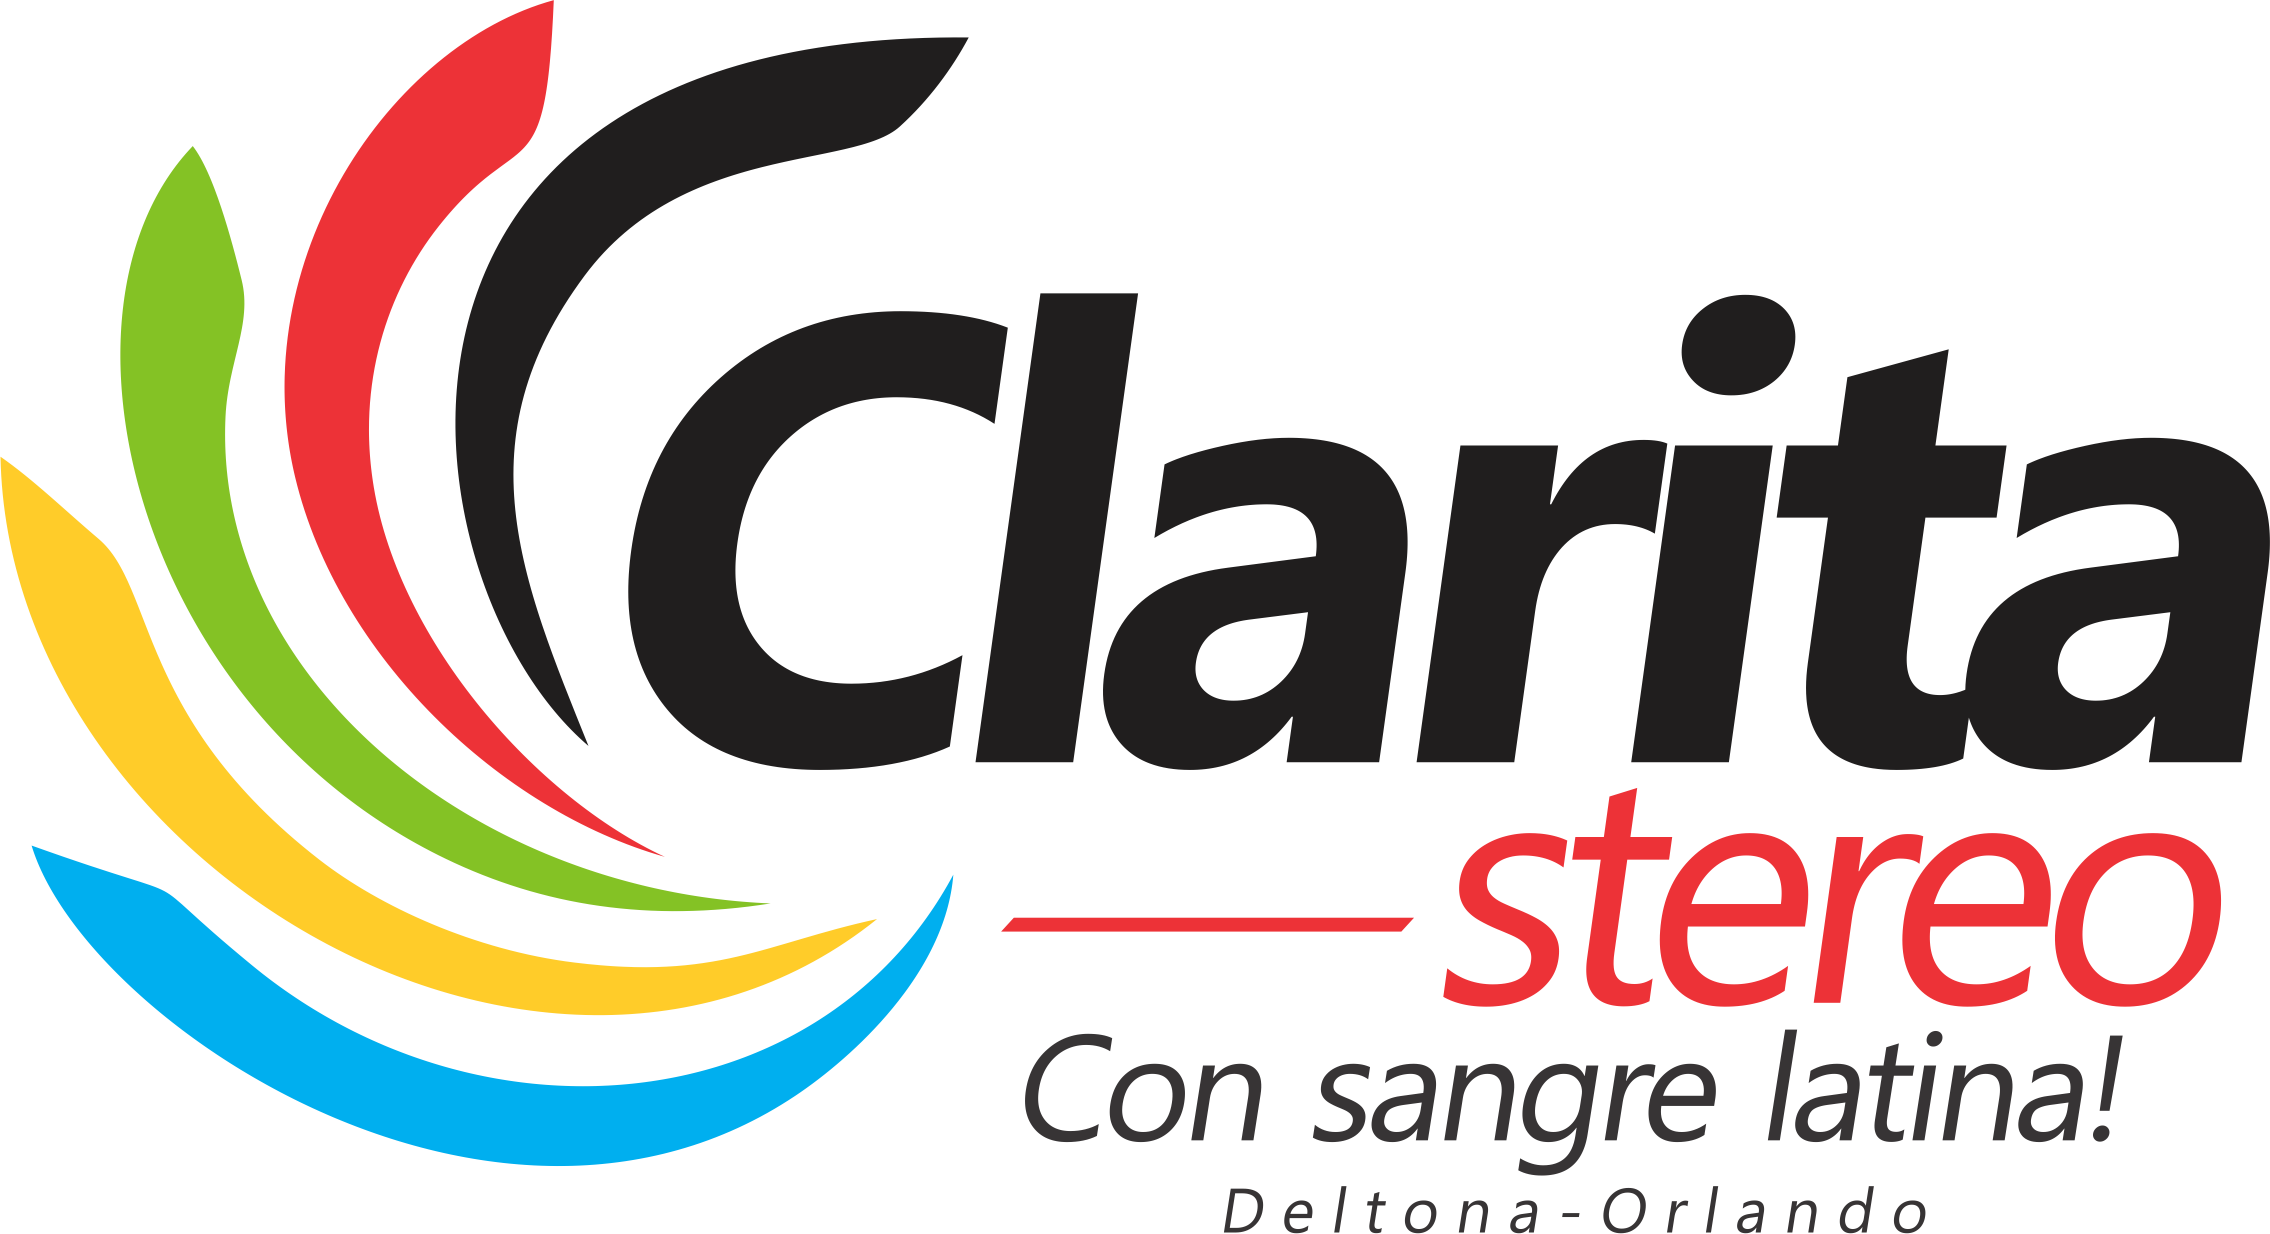 Clarita Stereo